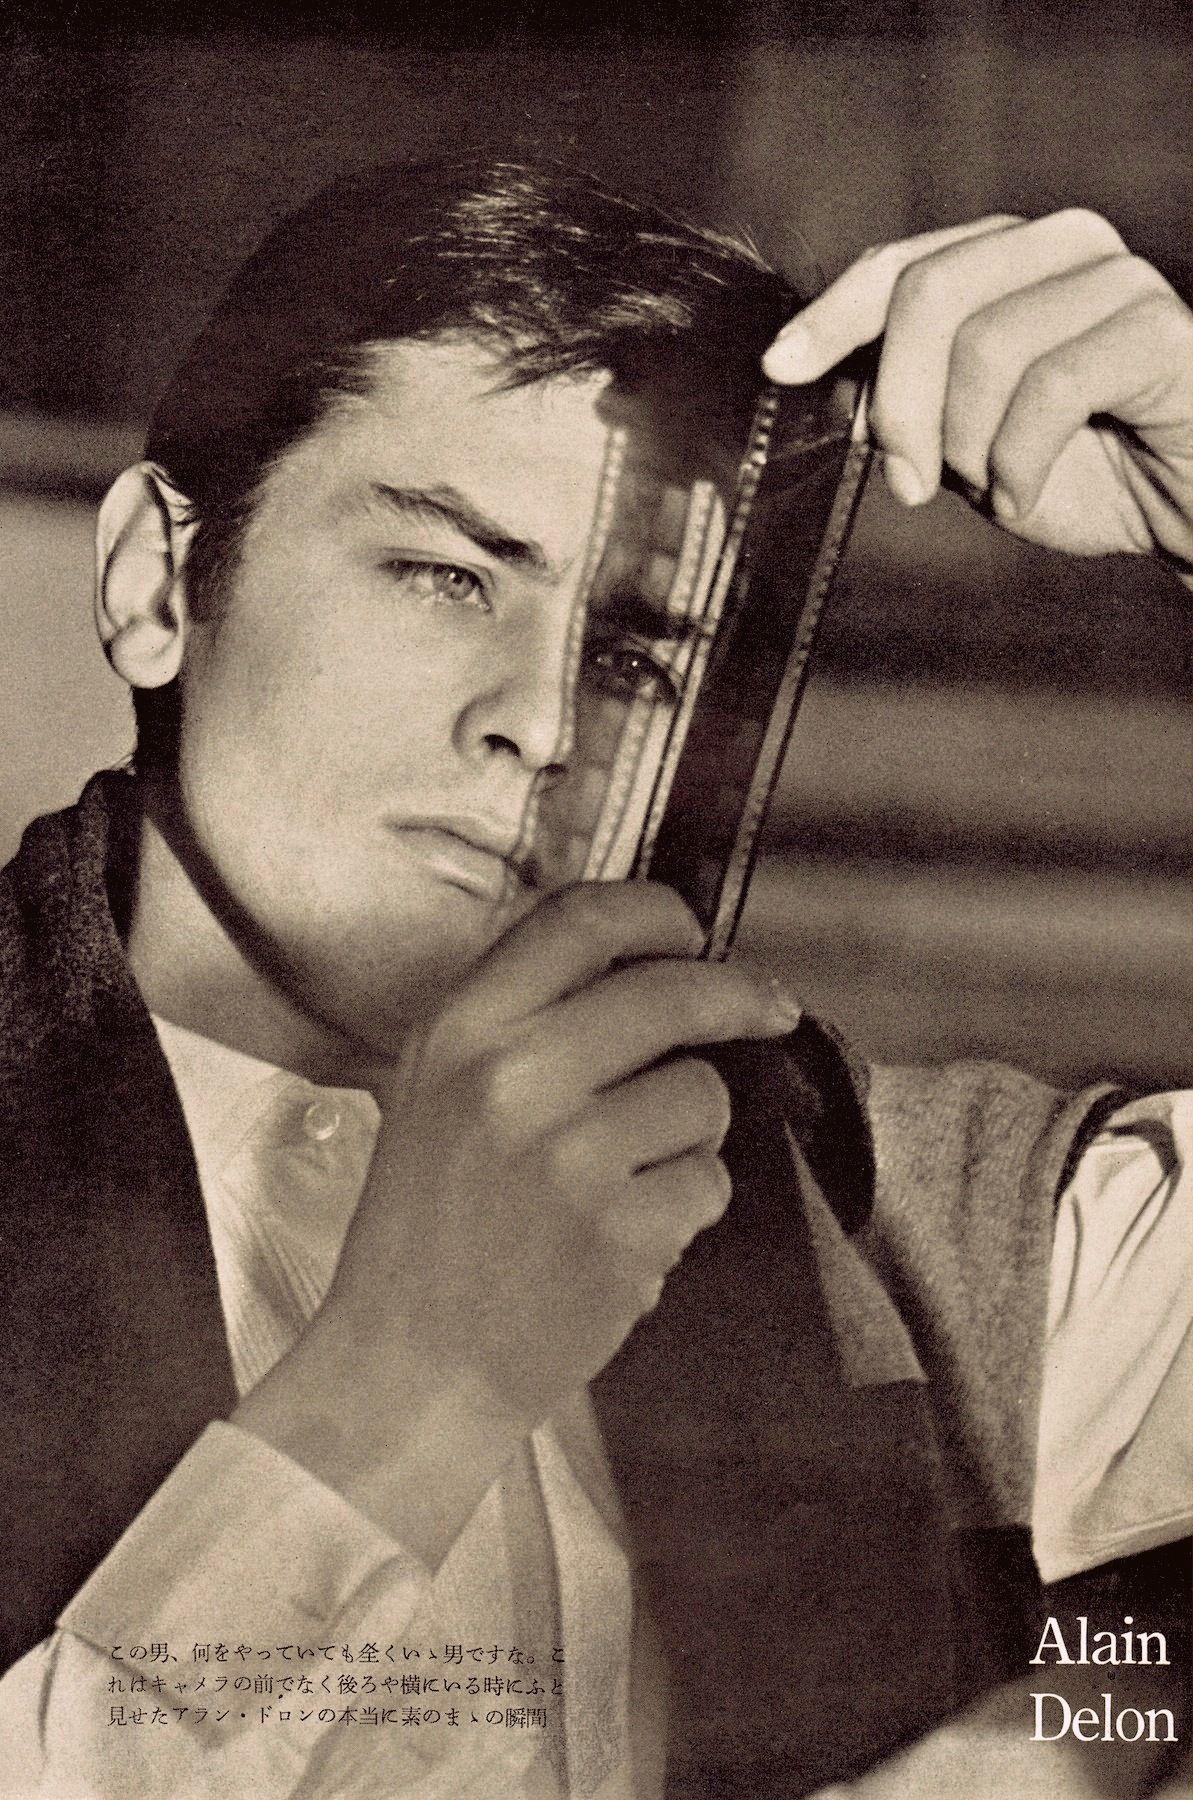 ALAIN DELON 1960's Ico...